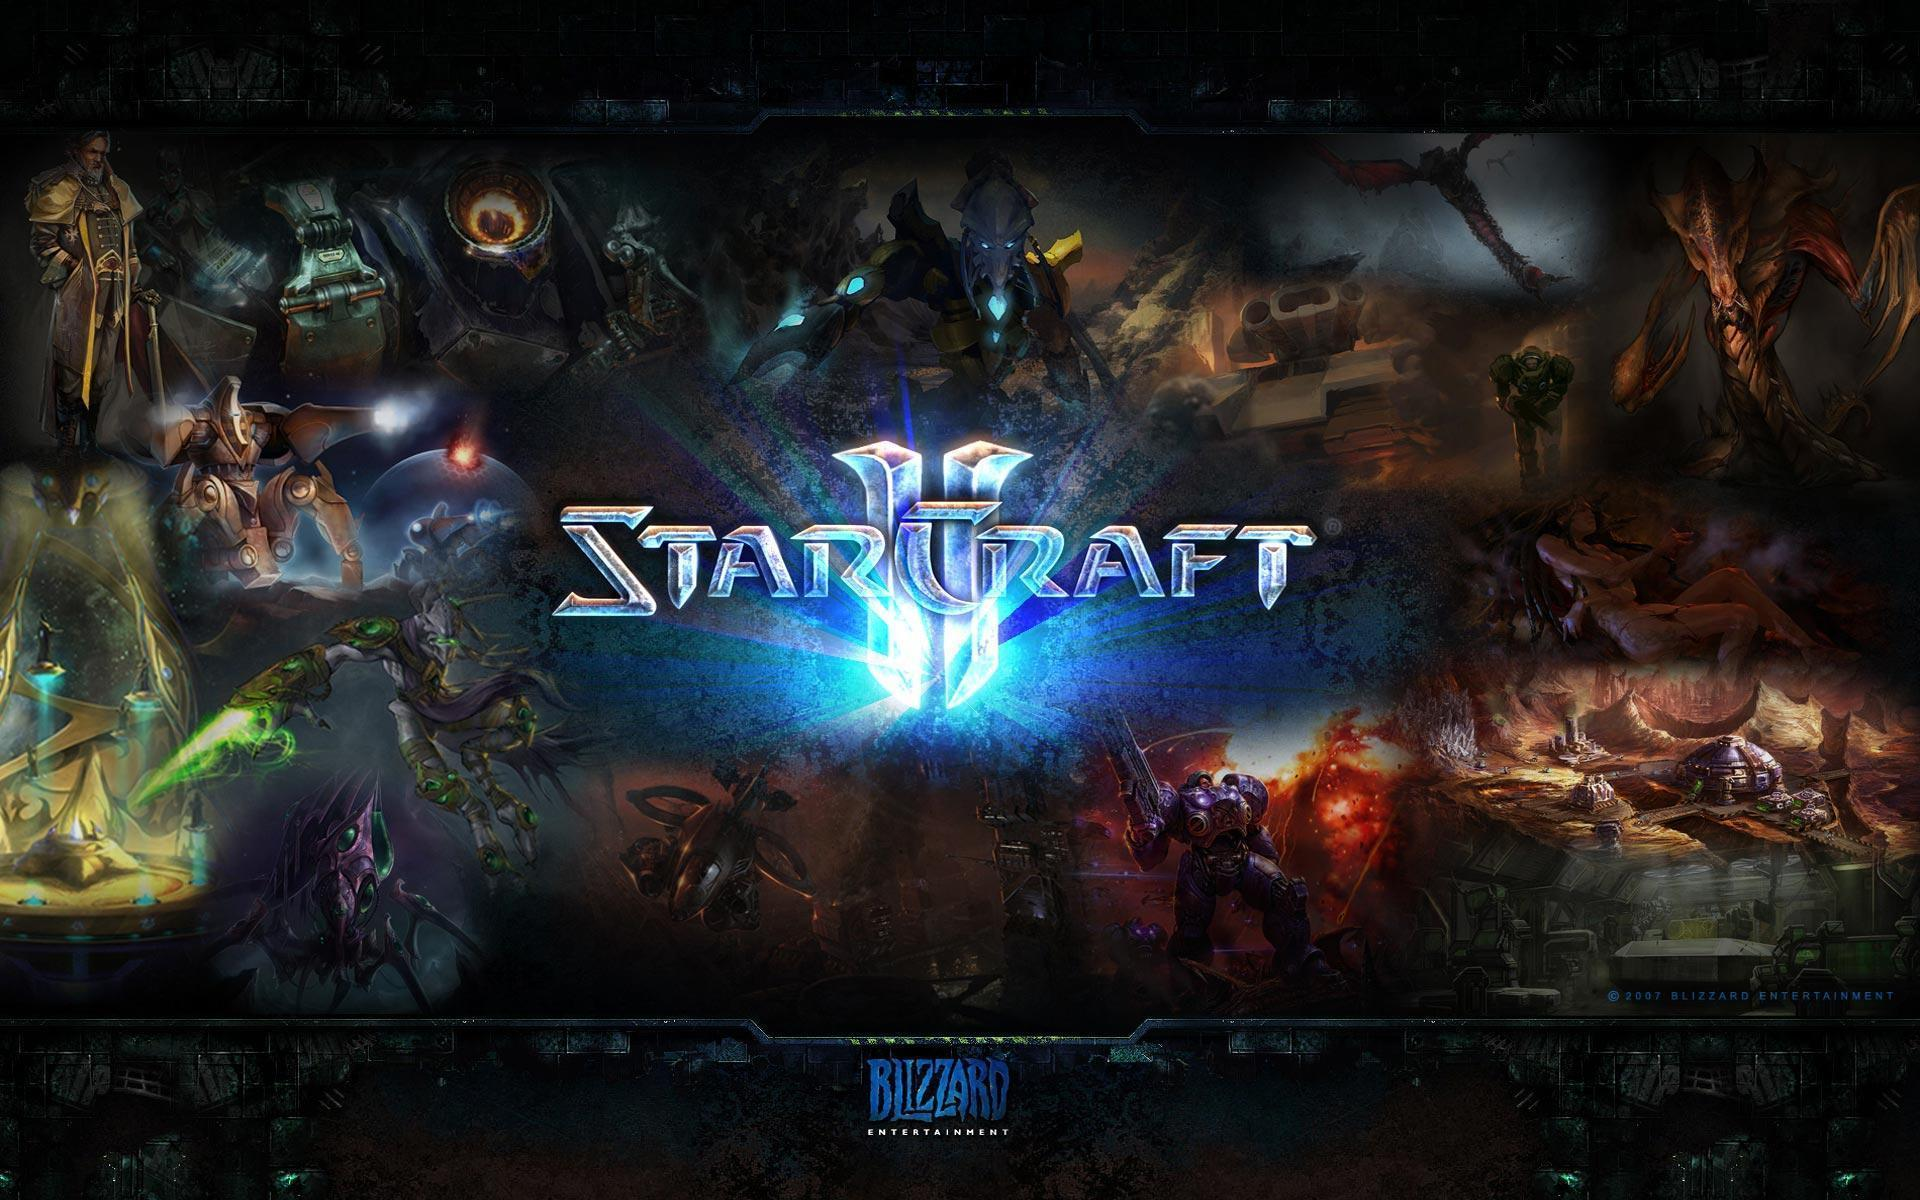 starcraft ii terran wallpaper - photo #24